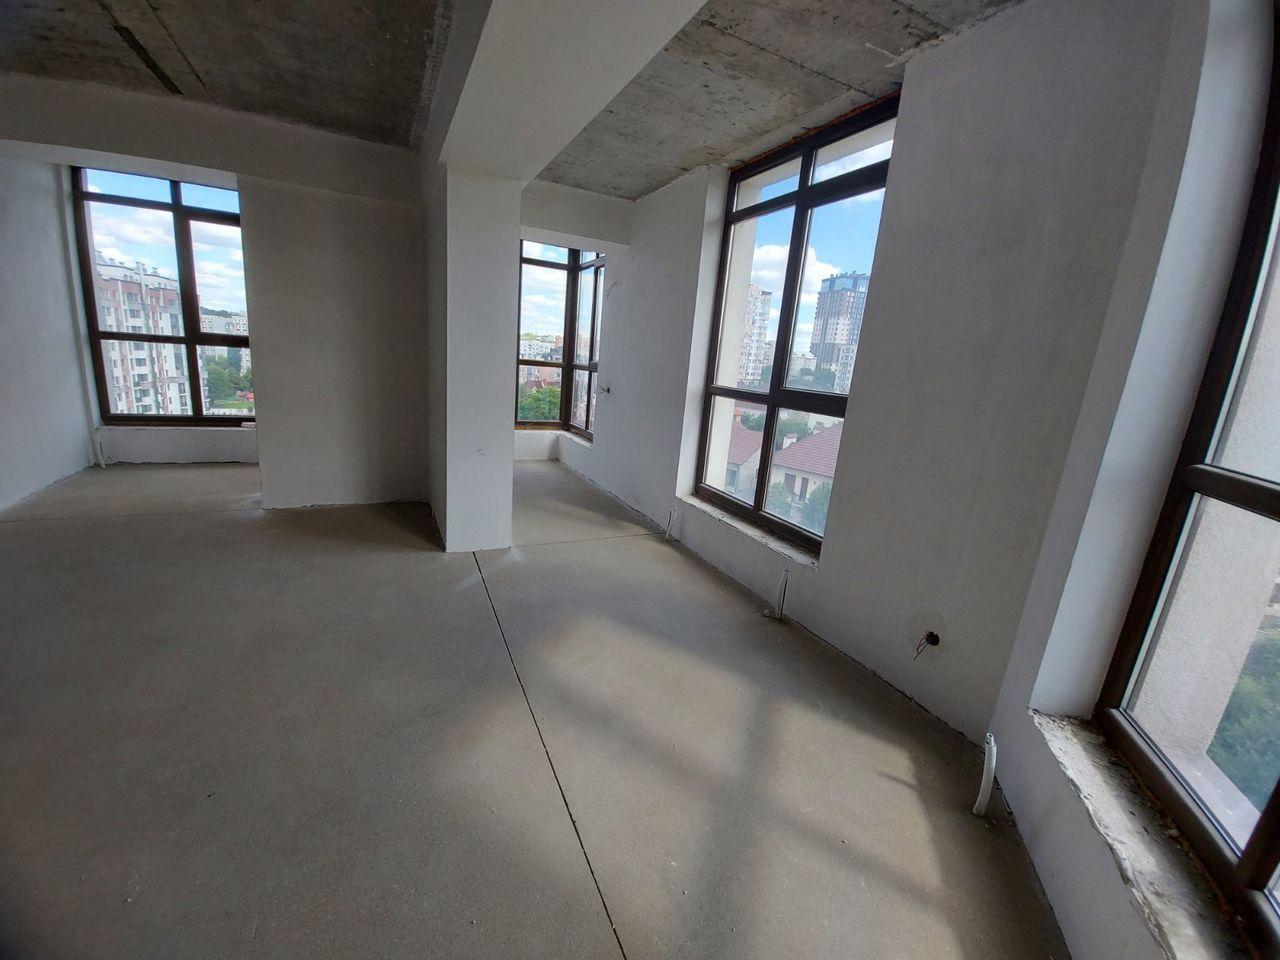 Apartament 2 odăi str.Ivan Zaikin panoramă variantă albă 82 m2